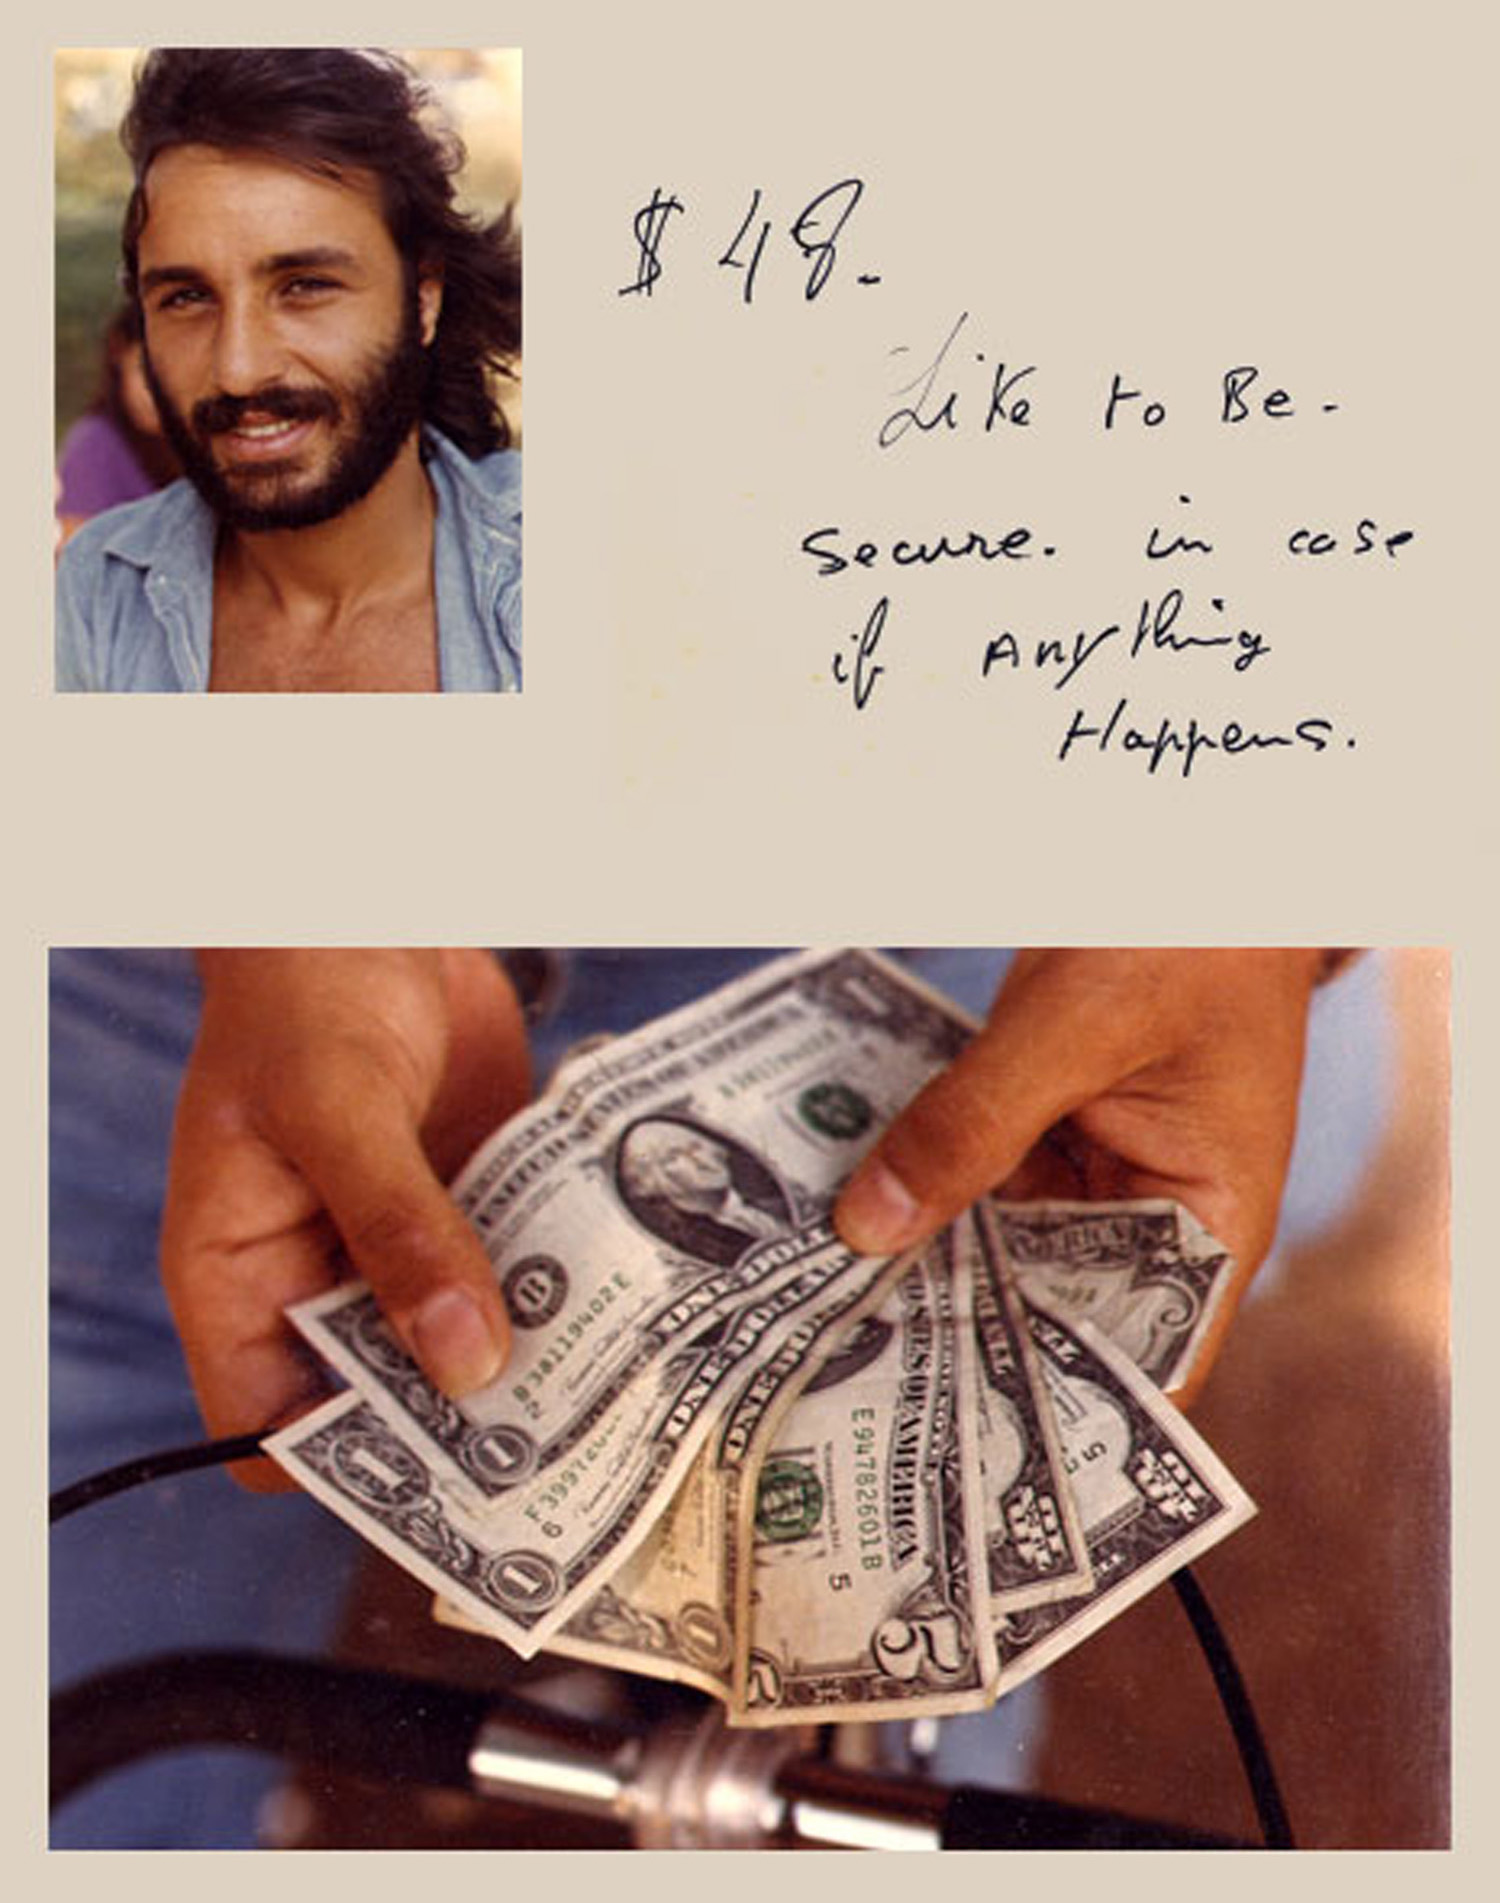 money-redesign-4 copy.jpg